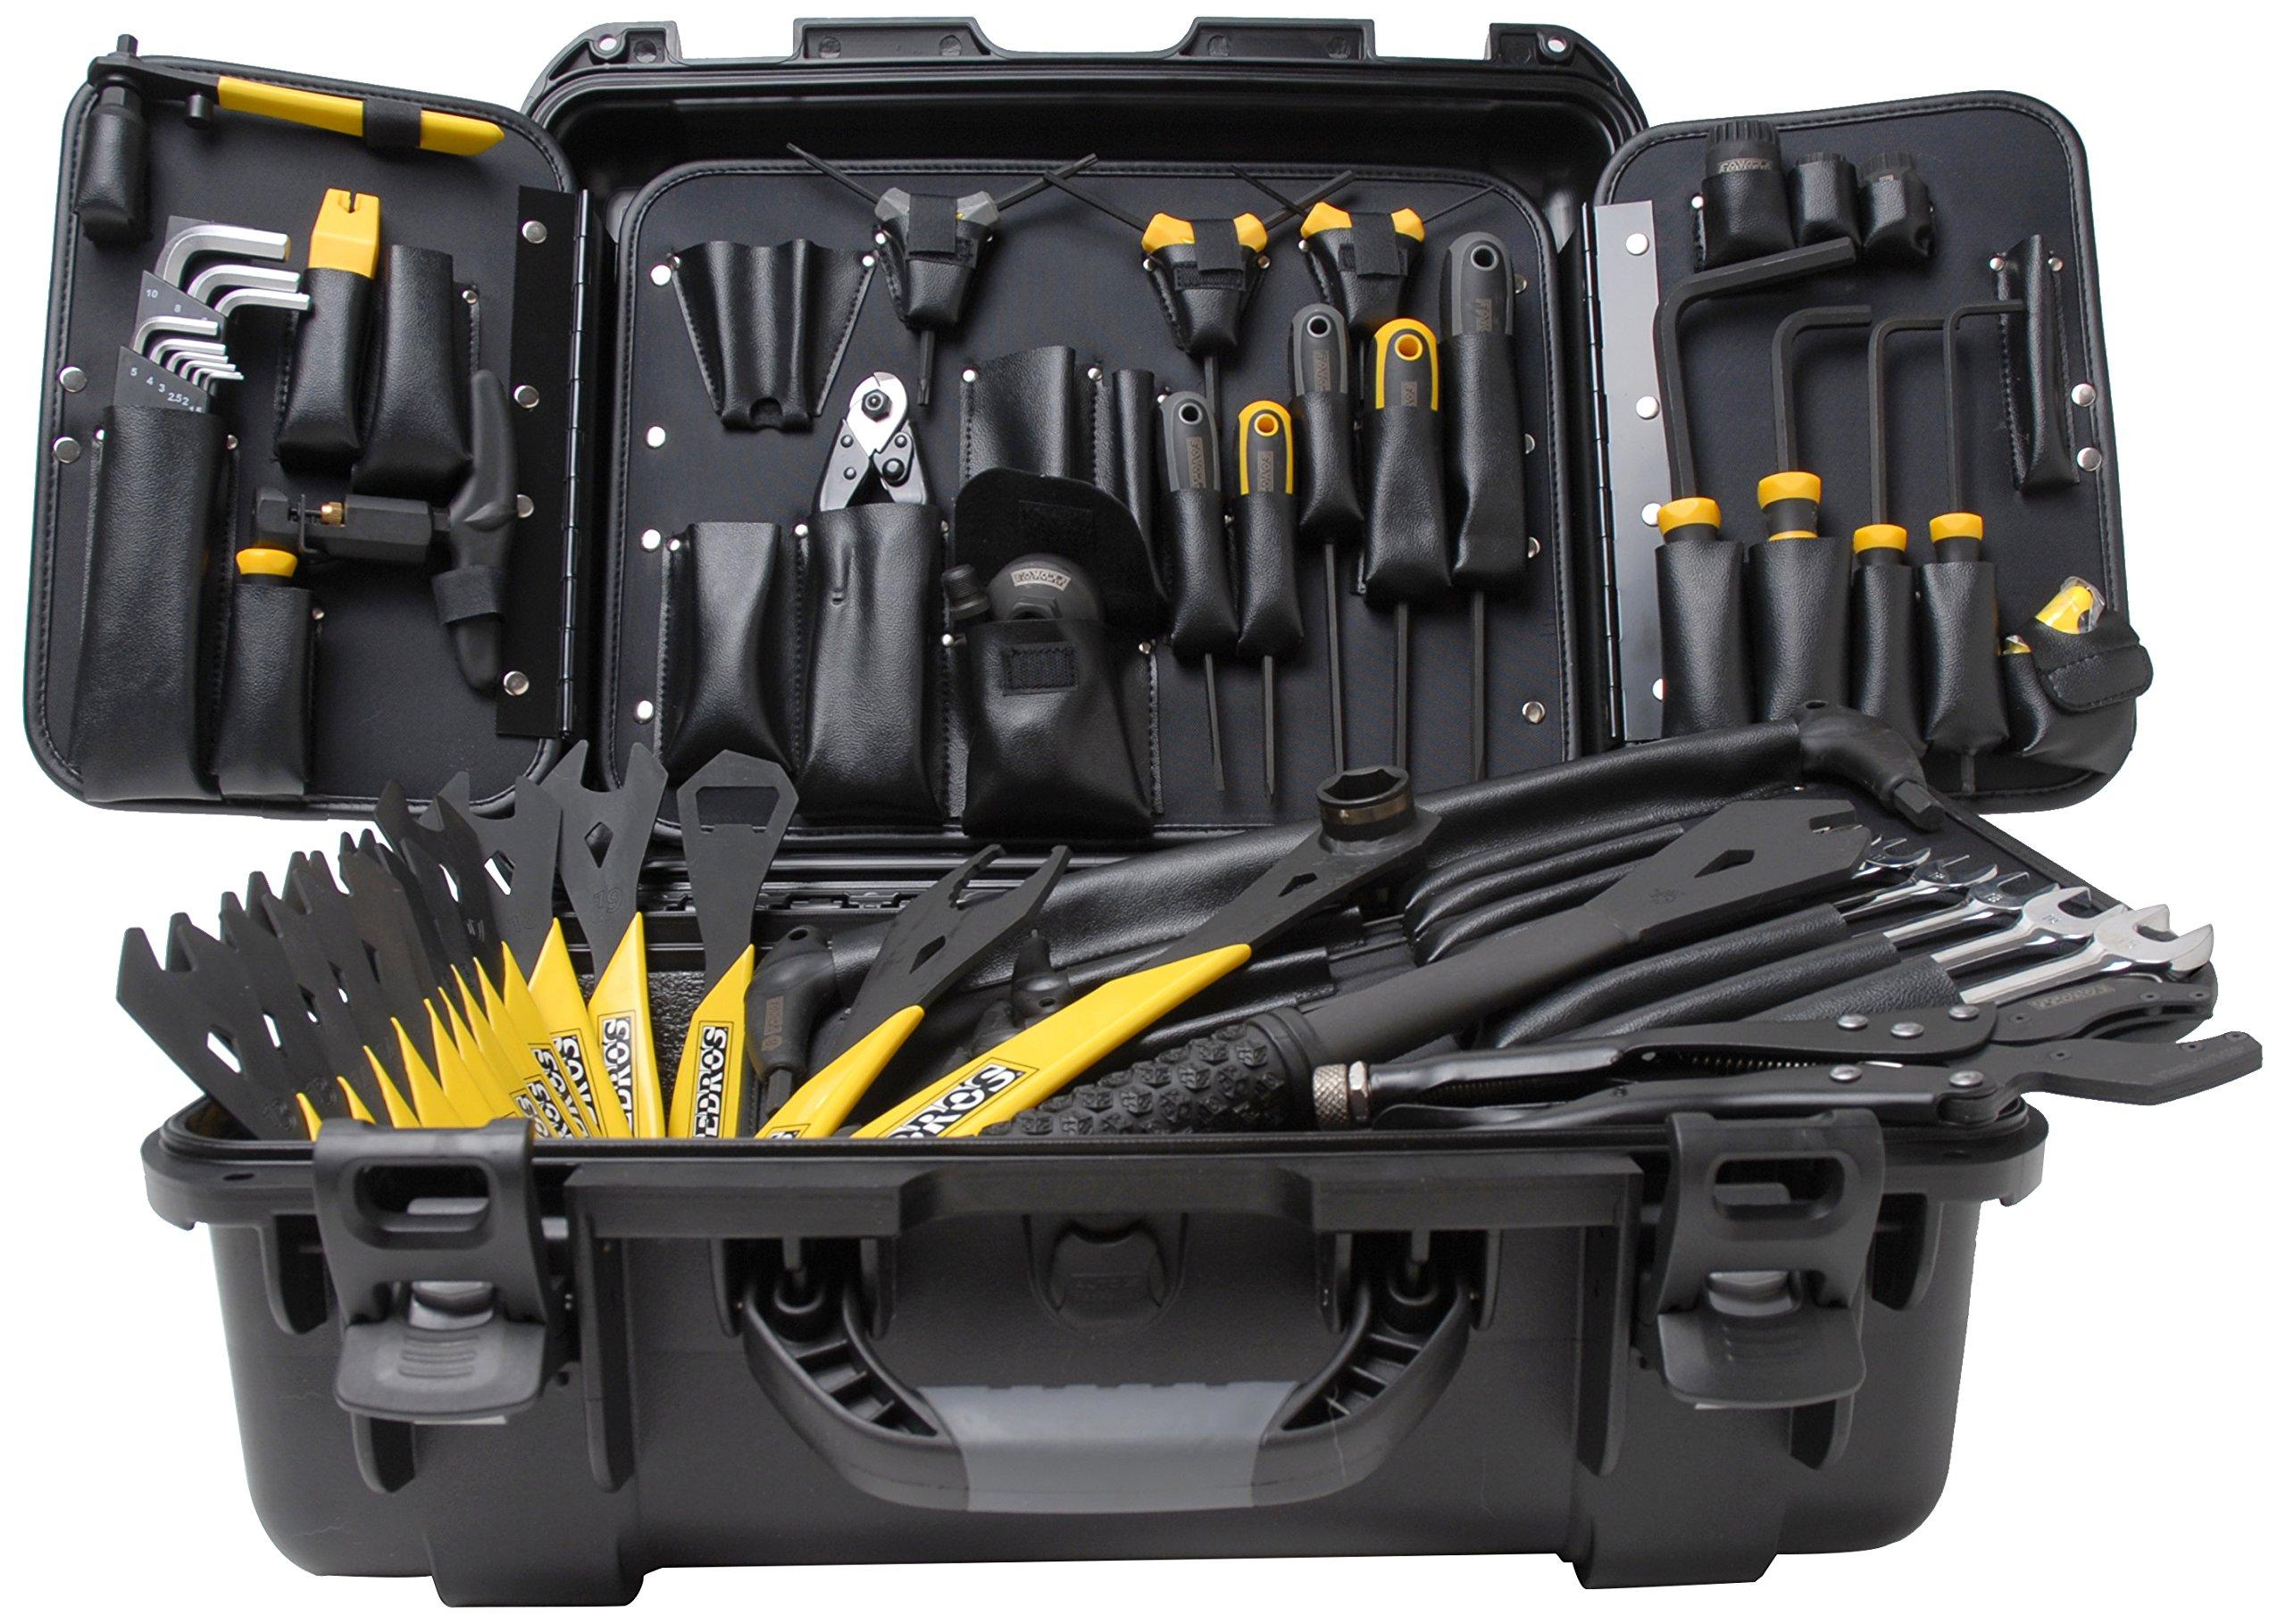 Pedros 3.0 Master Tool Kit by Pedros (Image #1)